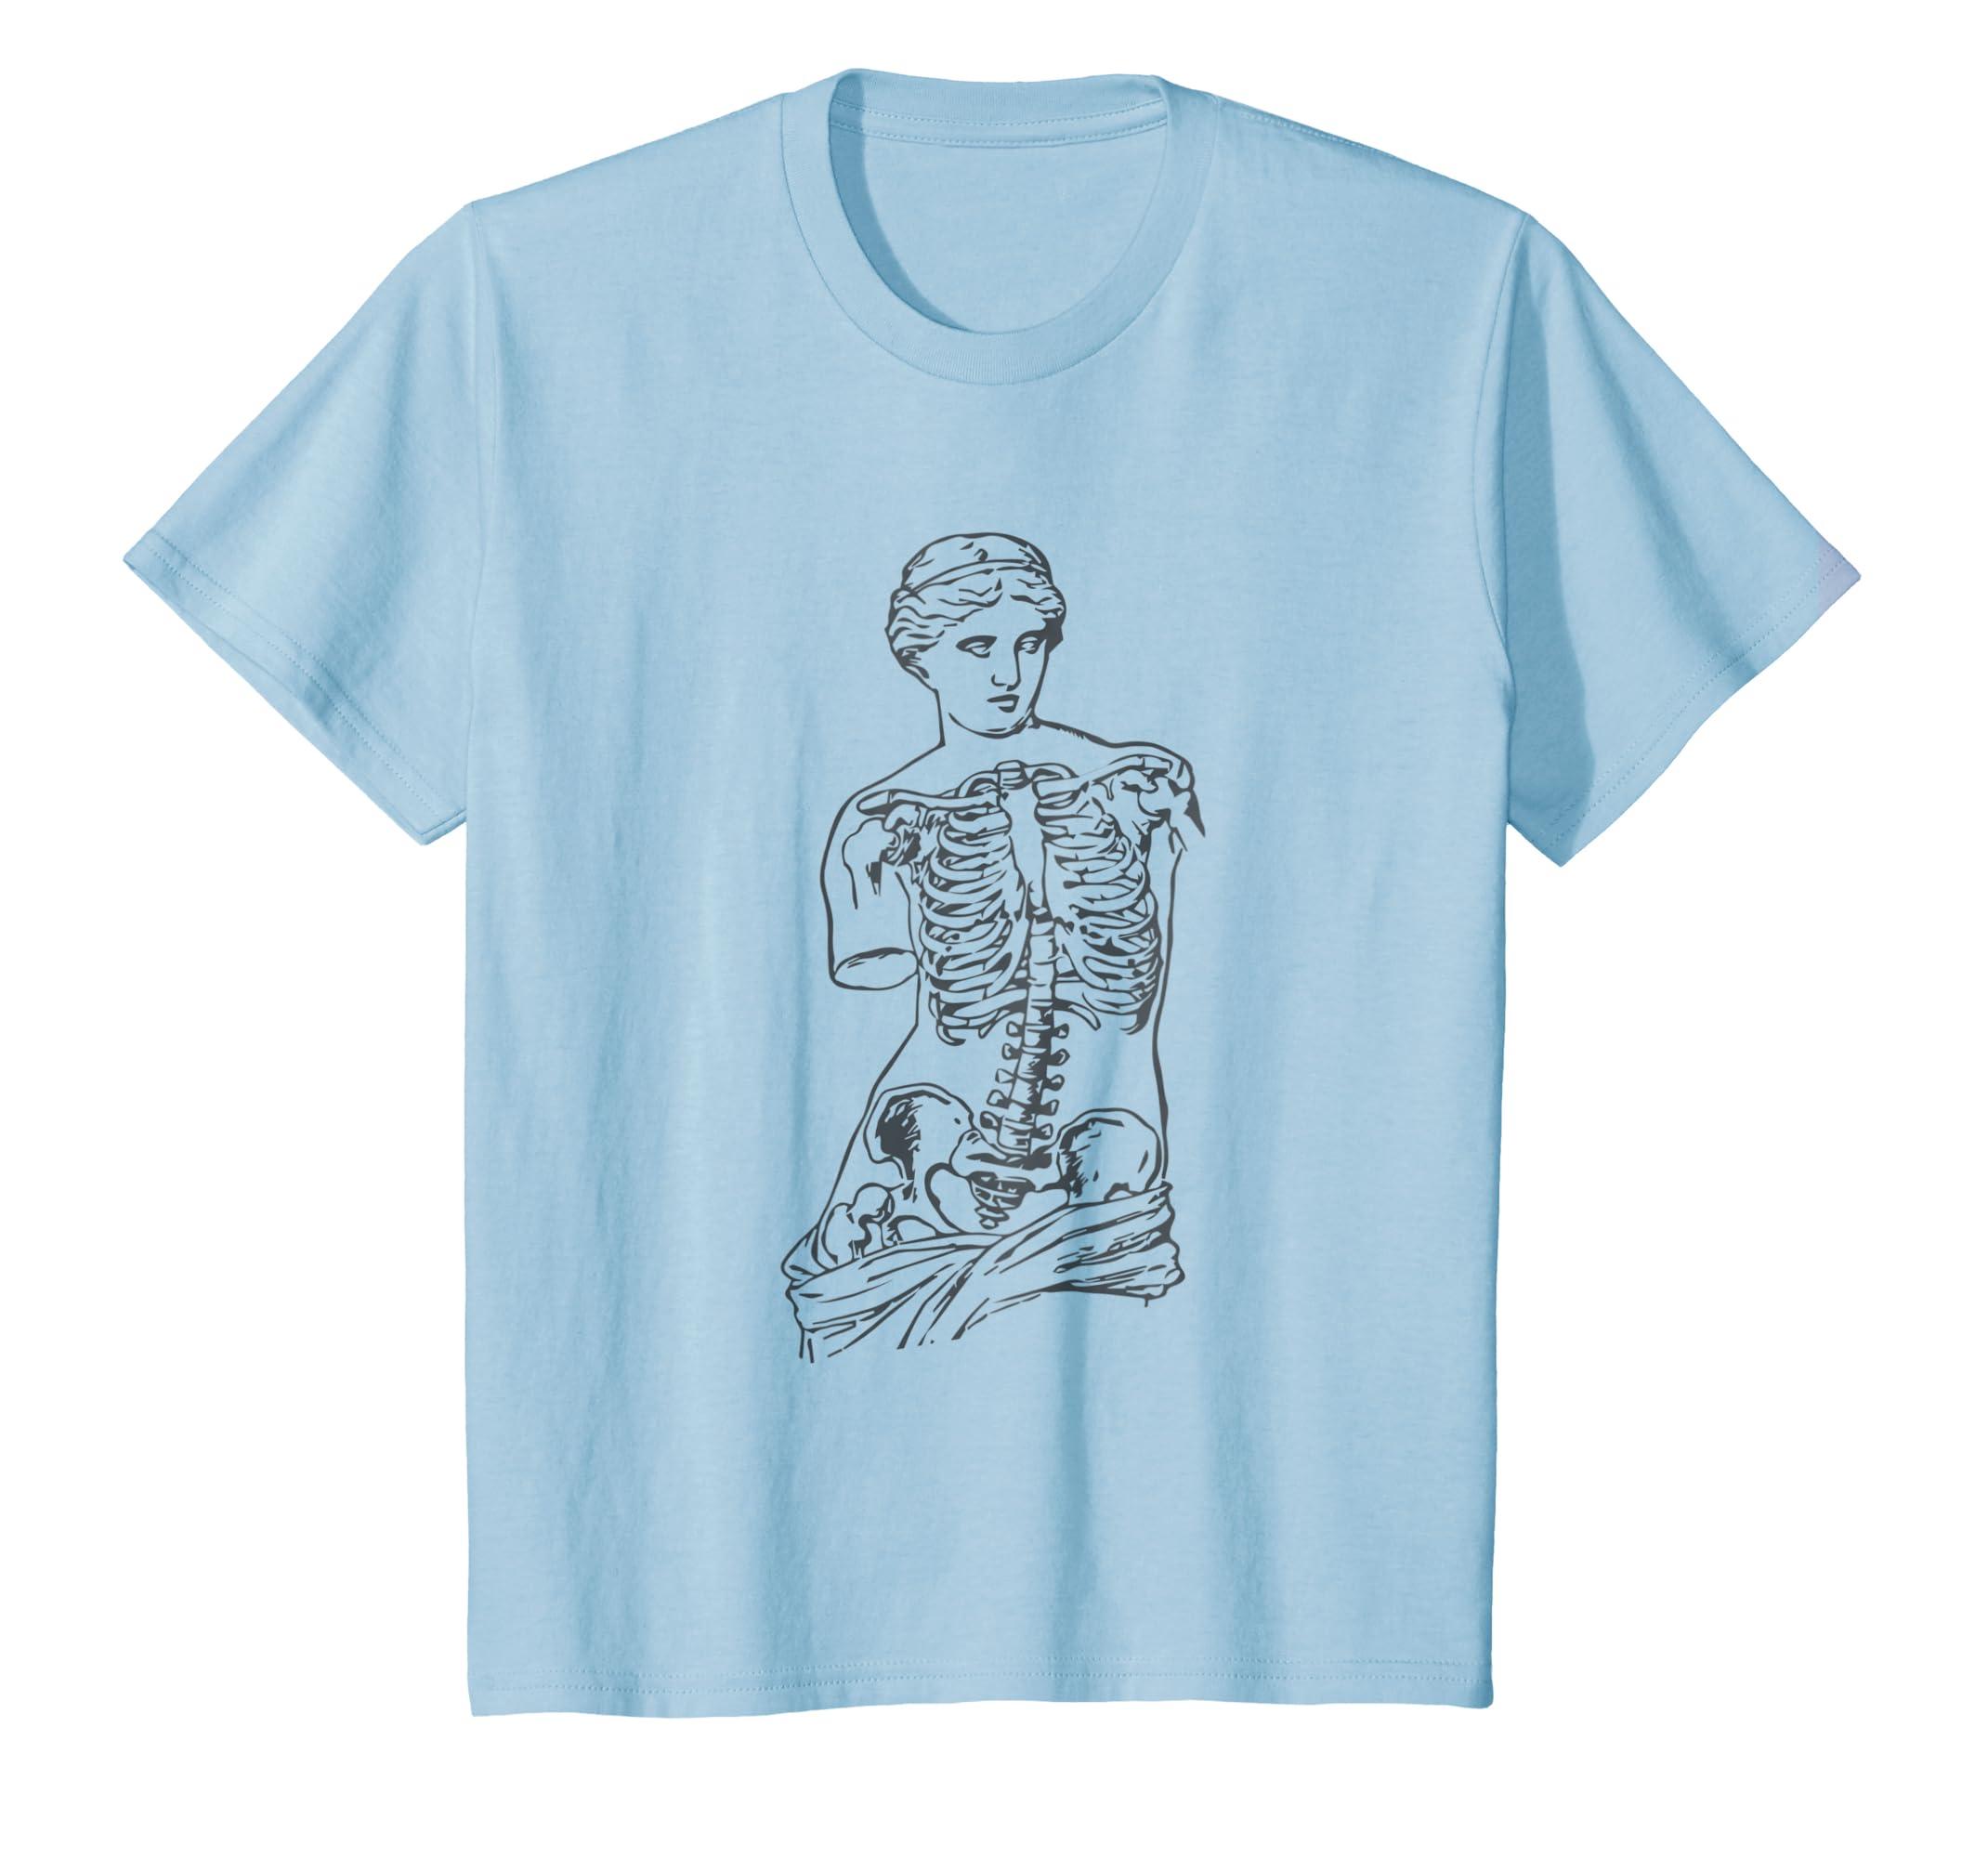 Venus Skeleton T Shirt Vaporwave Aesthetic Soft Grunge Tee Teechatpro